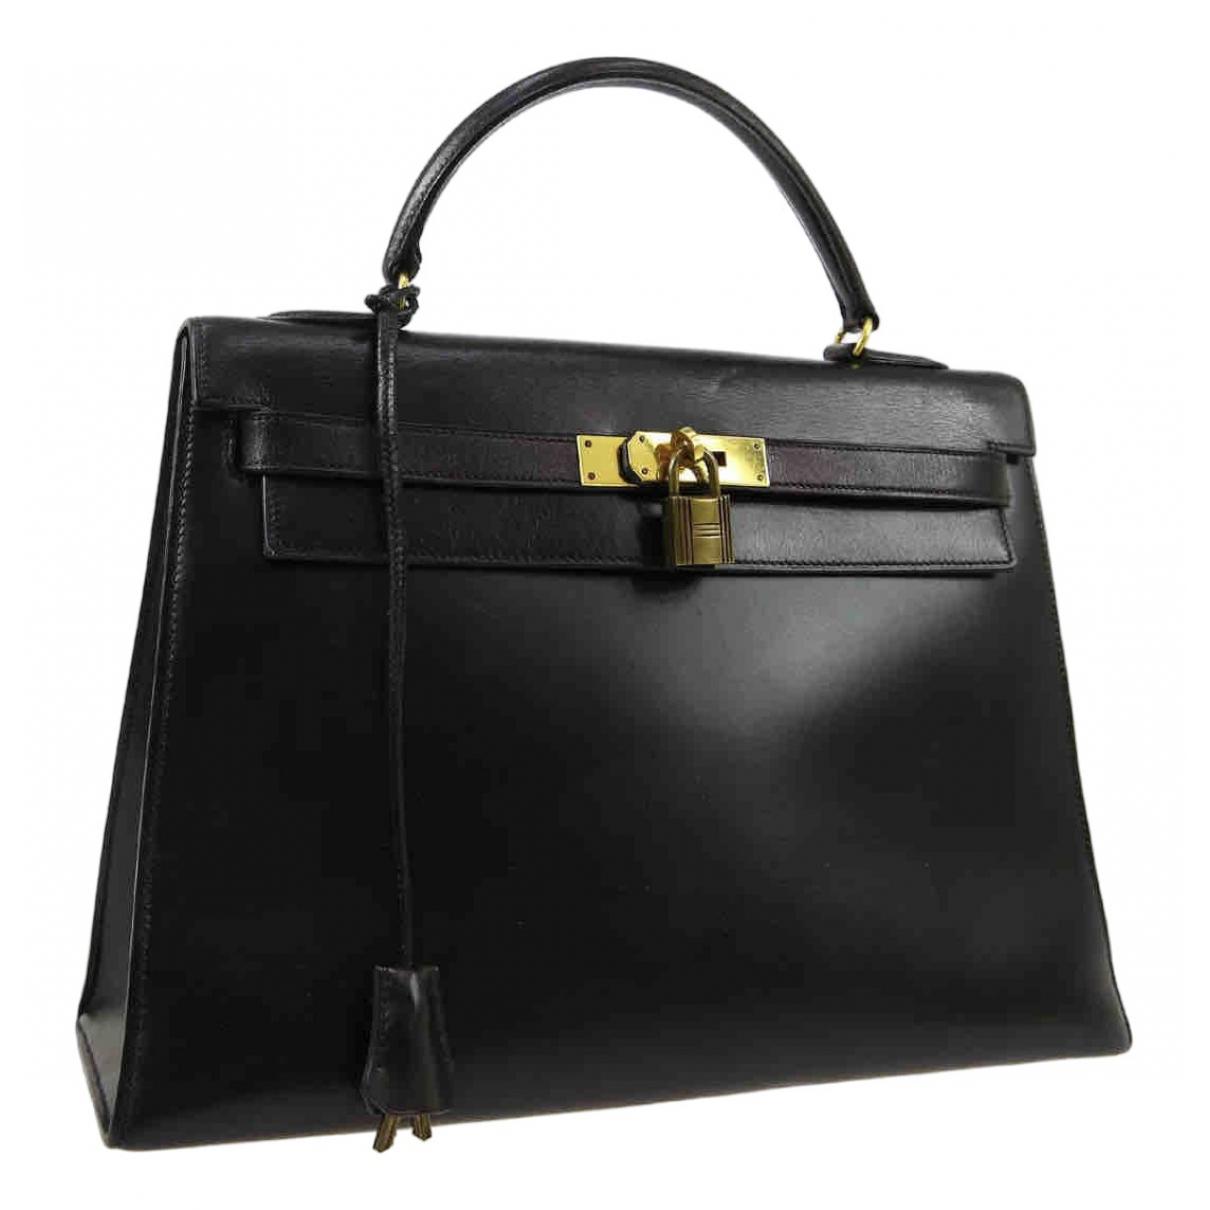 Hermès Kelly 32 Black Leather handbag for Women \N